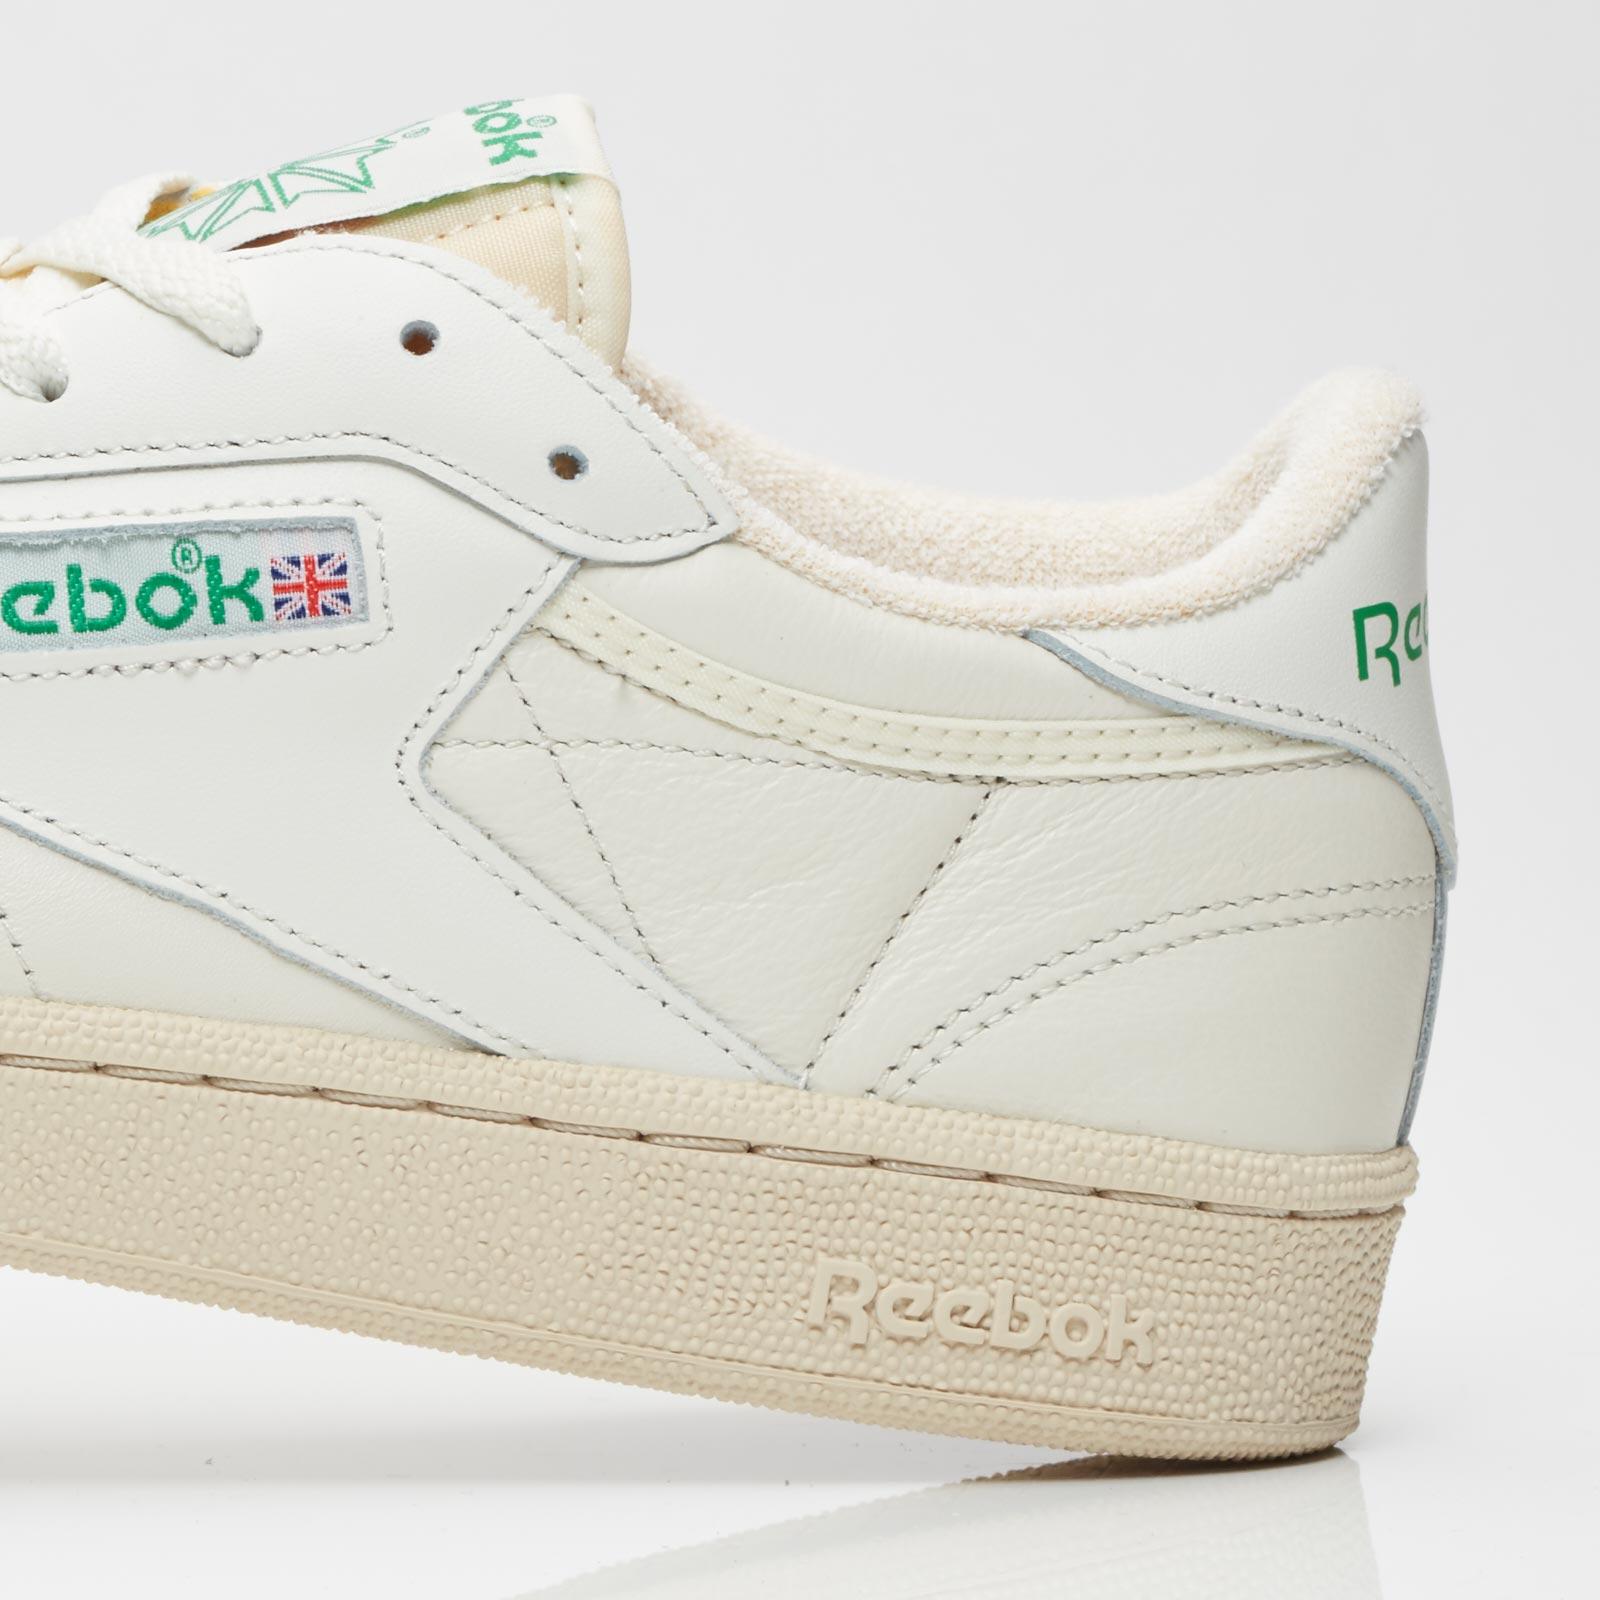 ceb2279e7f7 Reebok Club C 85 Vintage - Bs8242 - Sneakersnstuff